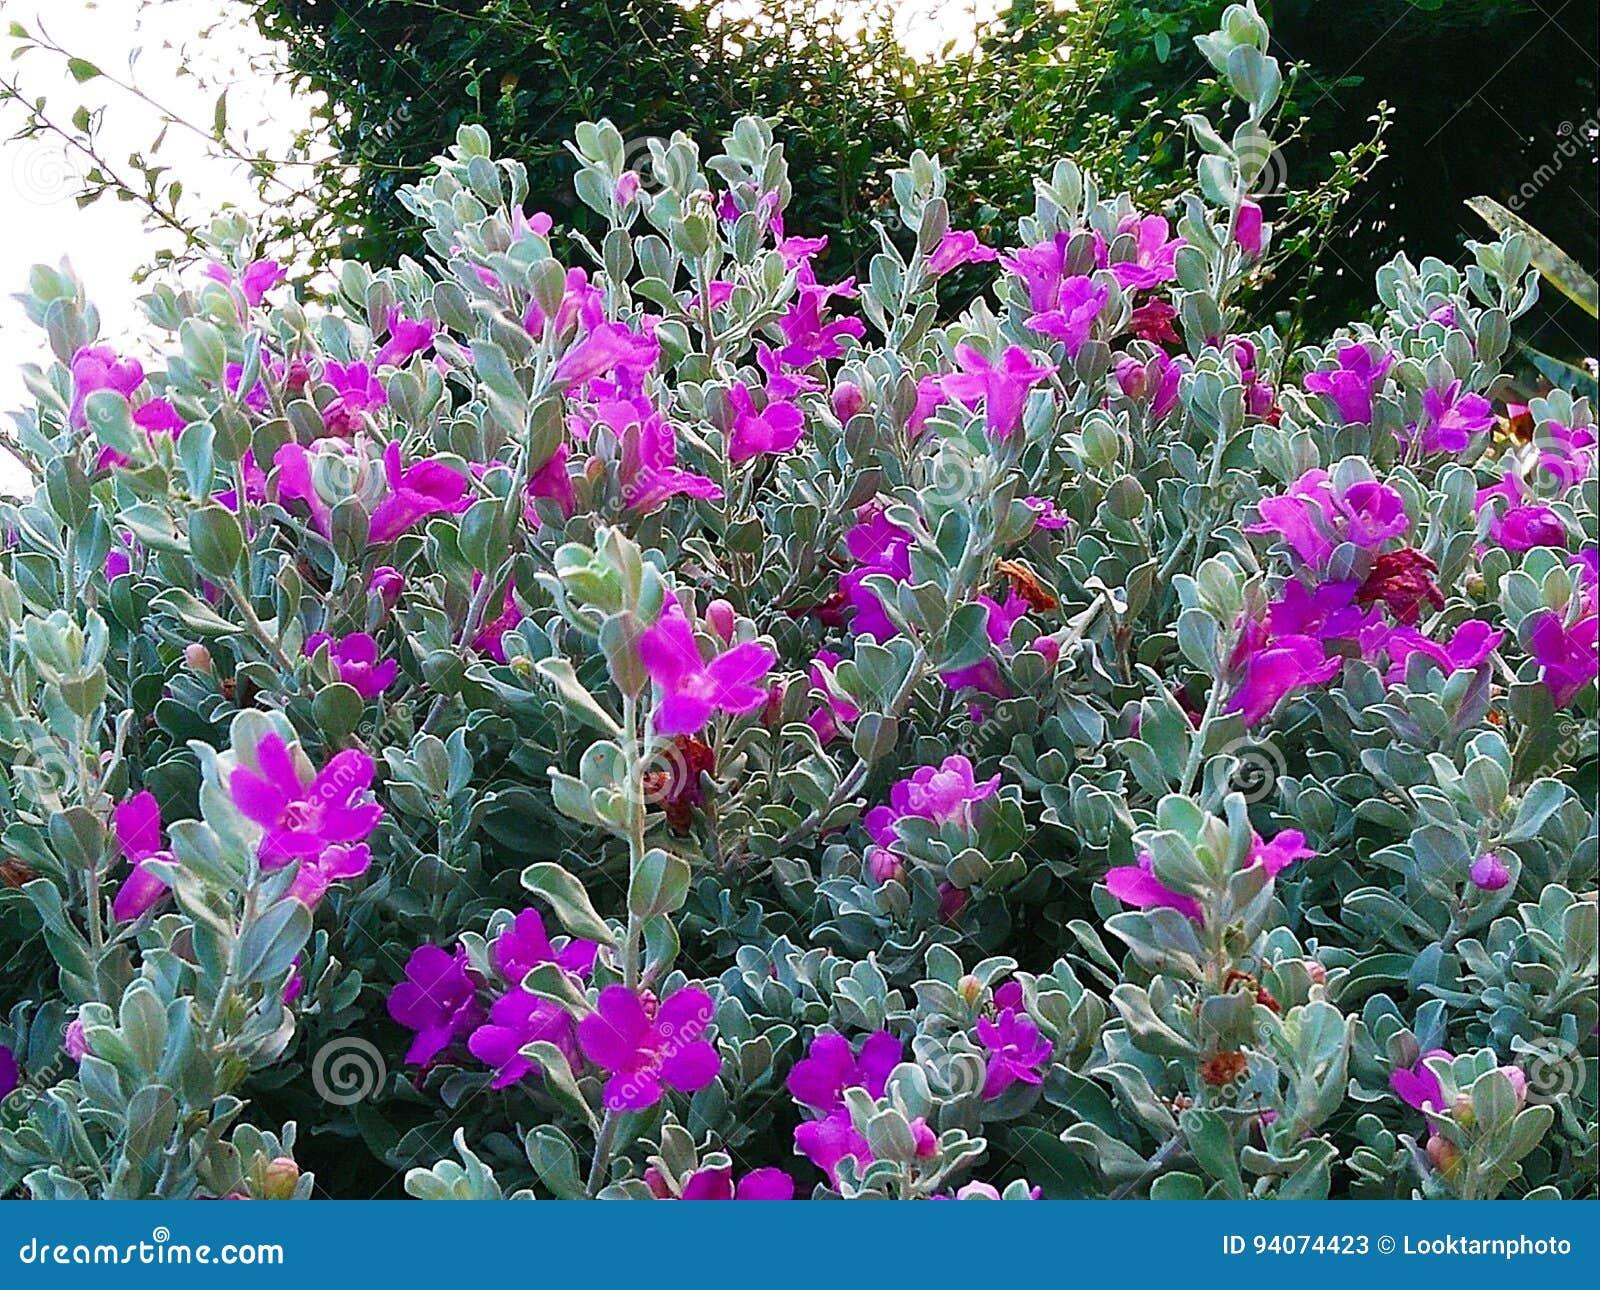 Leucophyllum Frutescens Stock Image Image Of Natural 94074423